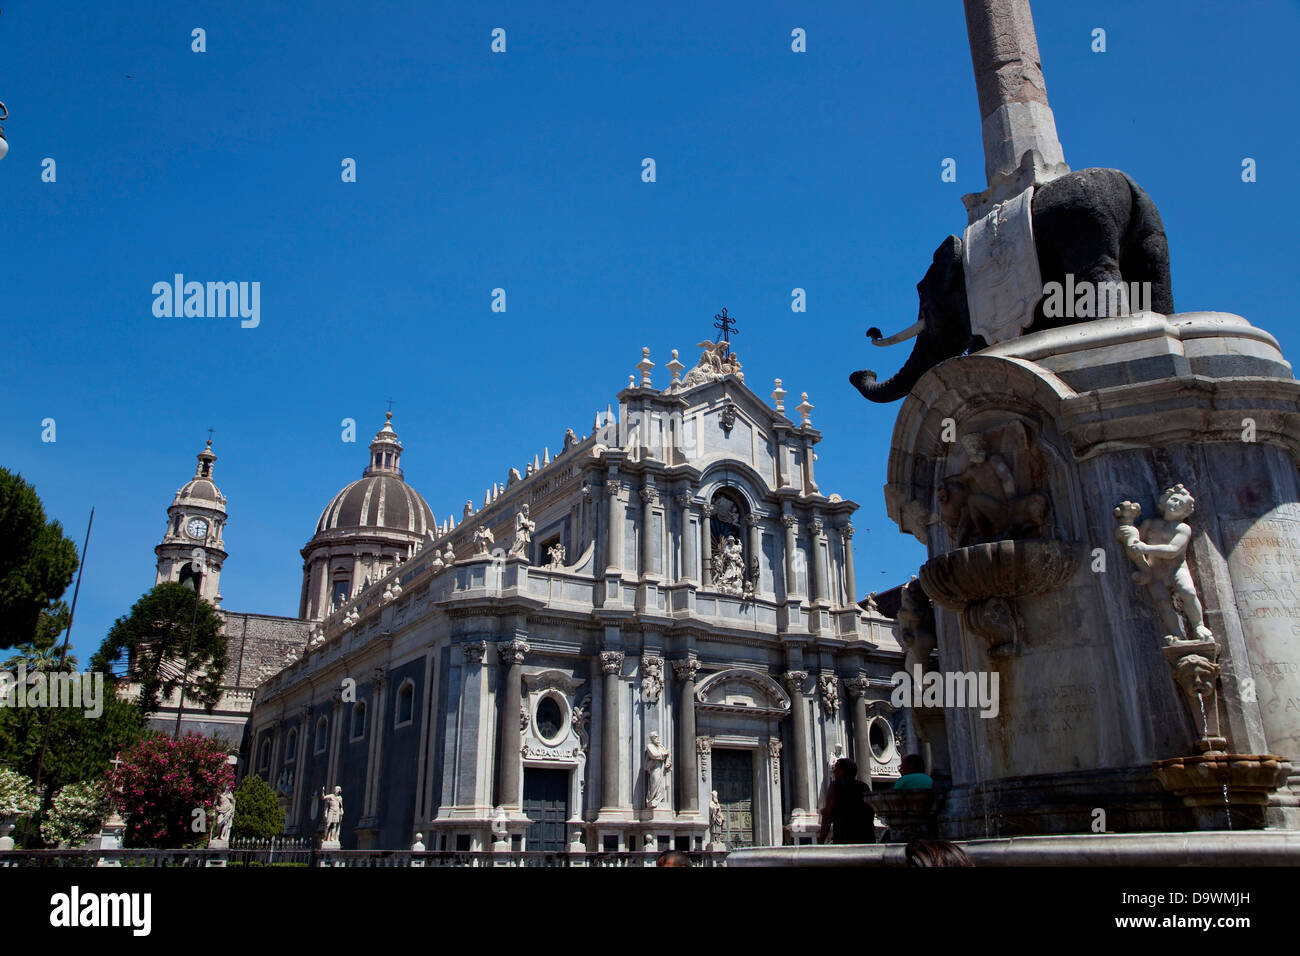 Dom, barocke Kathedrale und Platz in Catania, Sizilien, Sicilia, Italien, Italia Stockbild